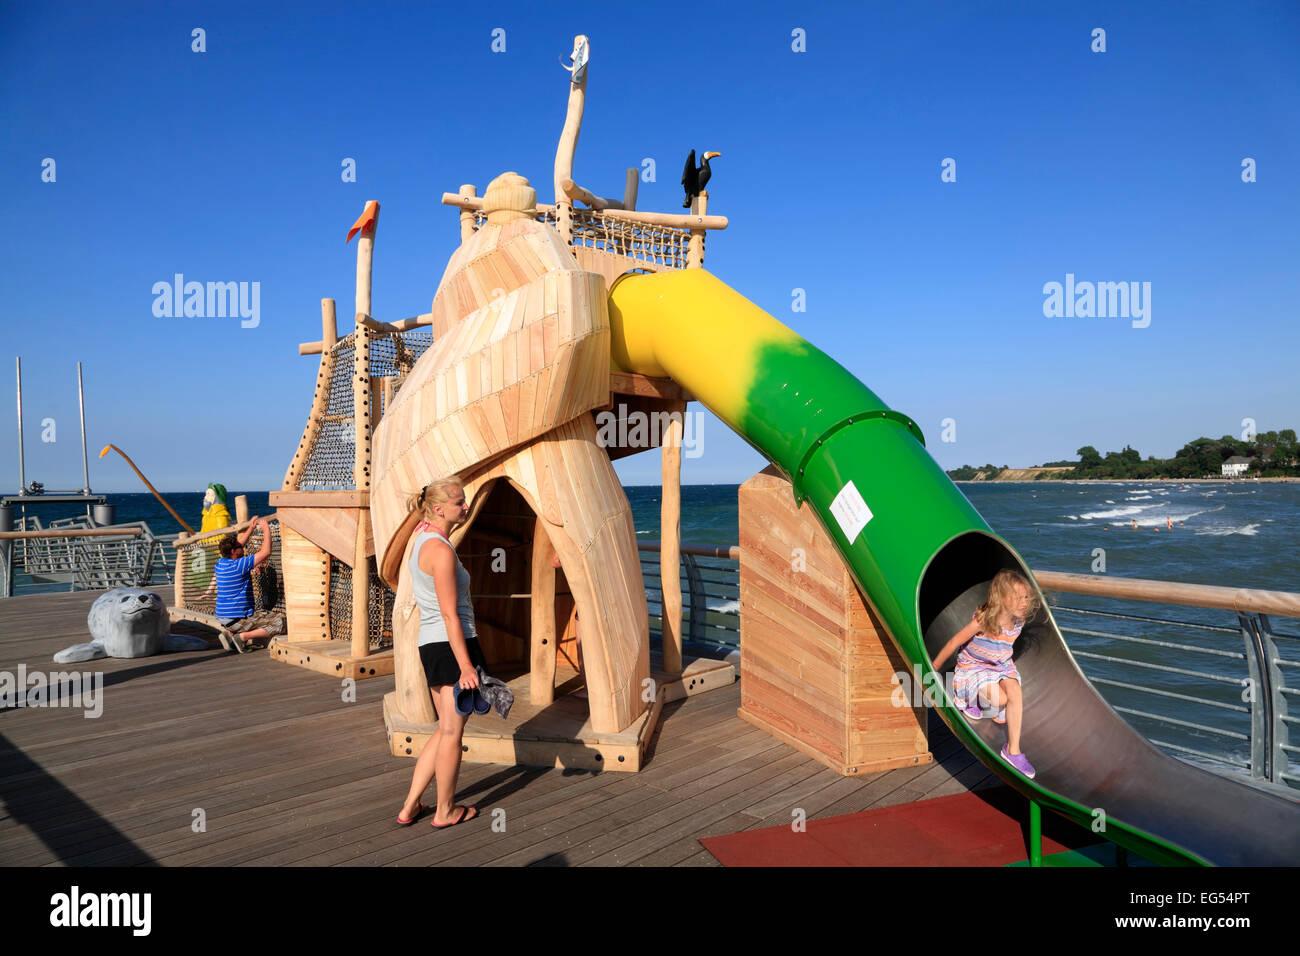 New pier in  Niendorf, Baltic Sea coast, Schleswig-Holstein, Germany, Europe Stock Photo